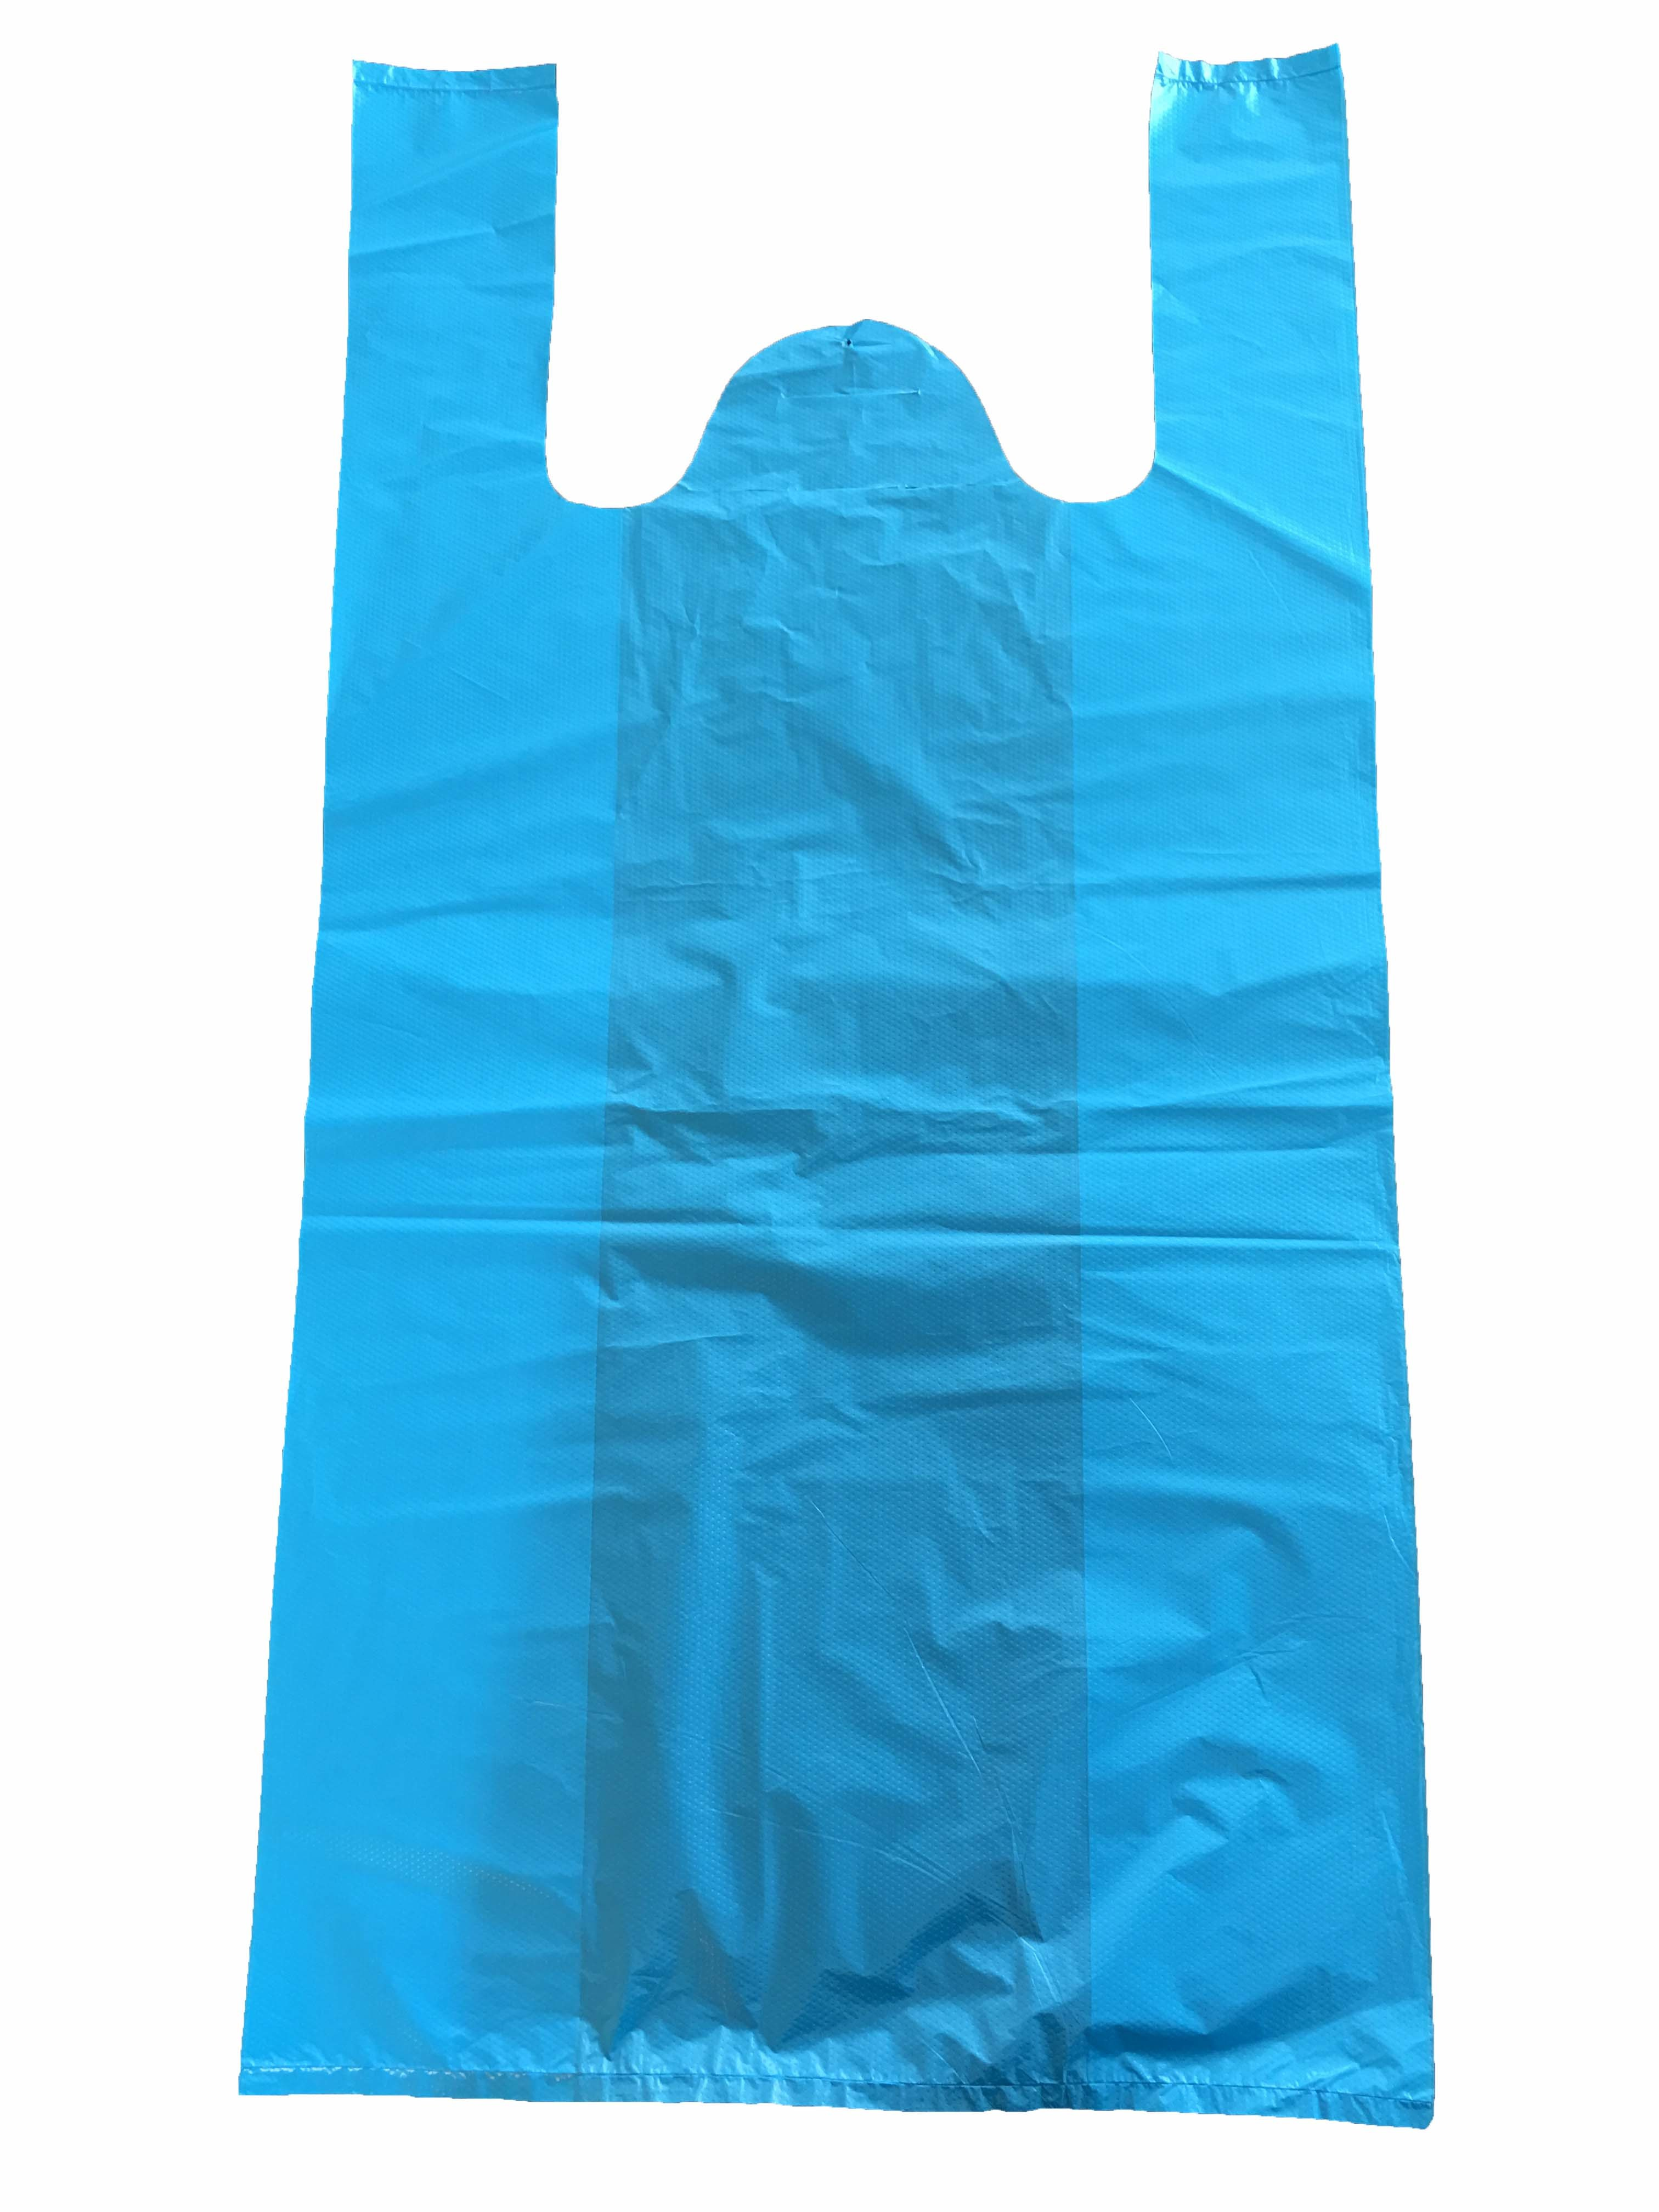 HDPE Plastic Blue T-Shirt Bag